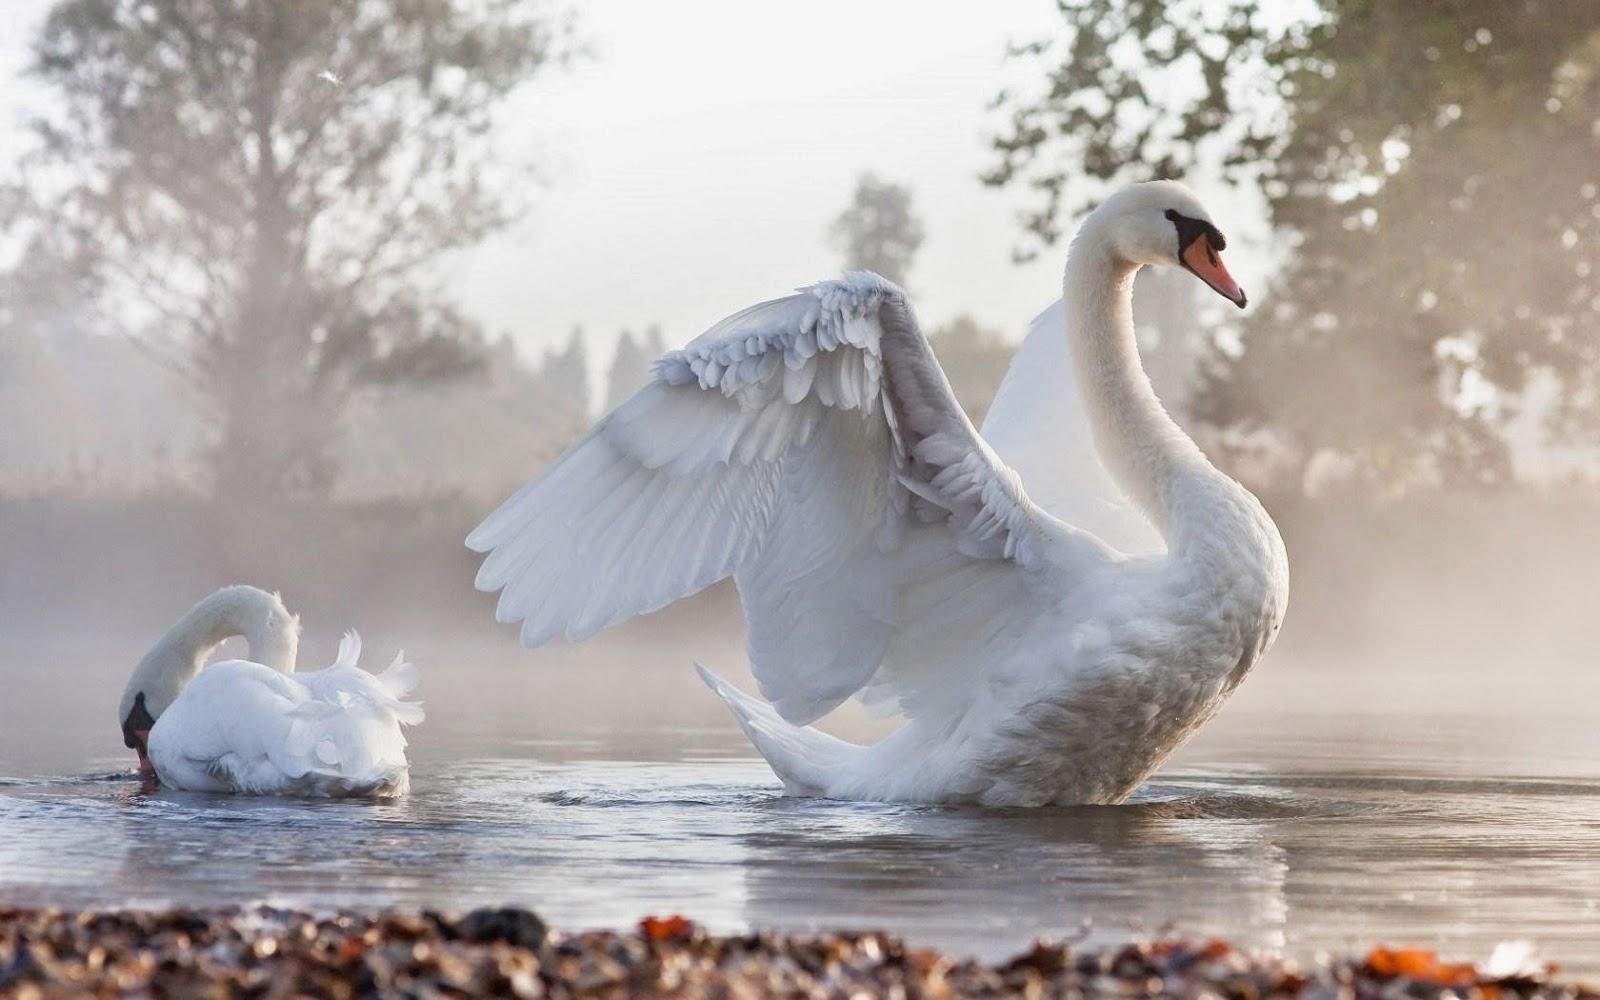 Swan bird wallpaper - photo#6